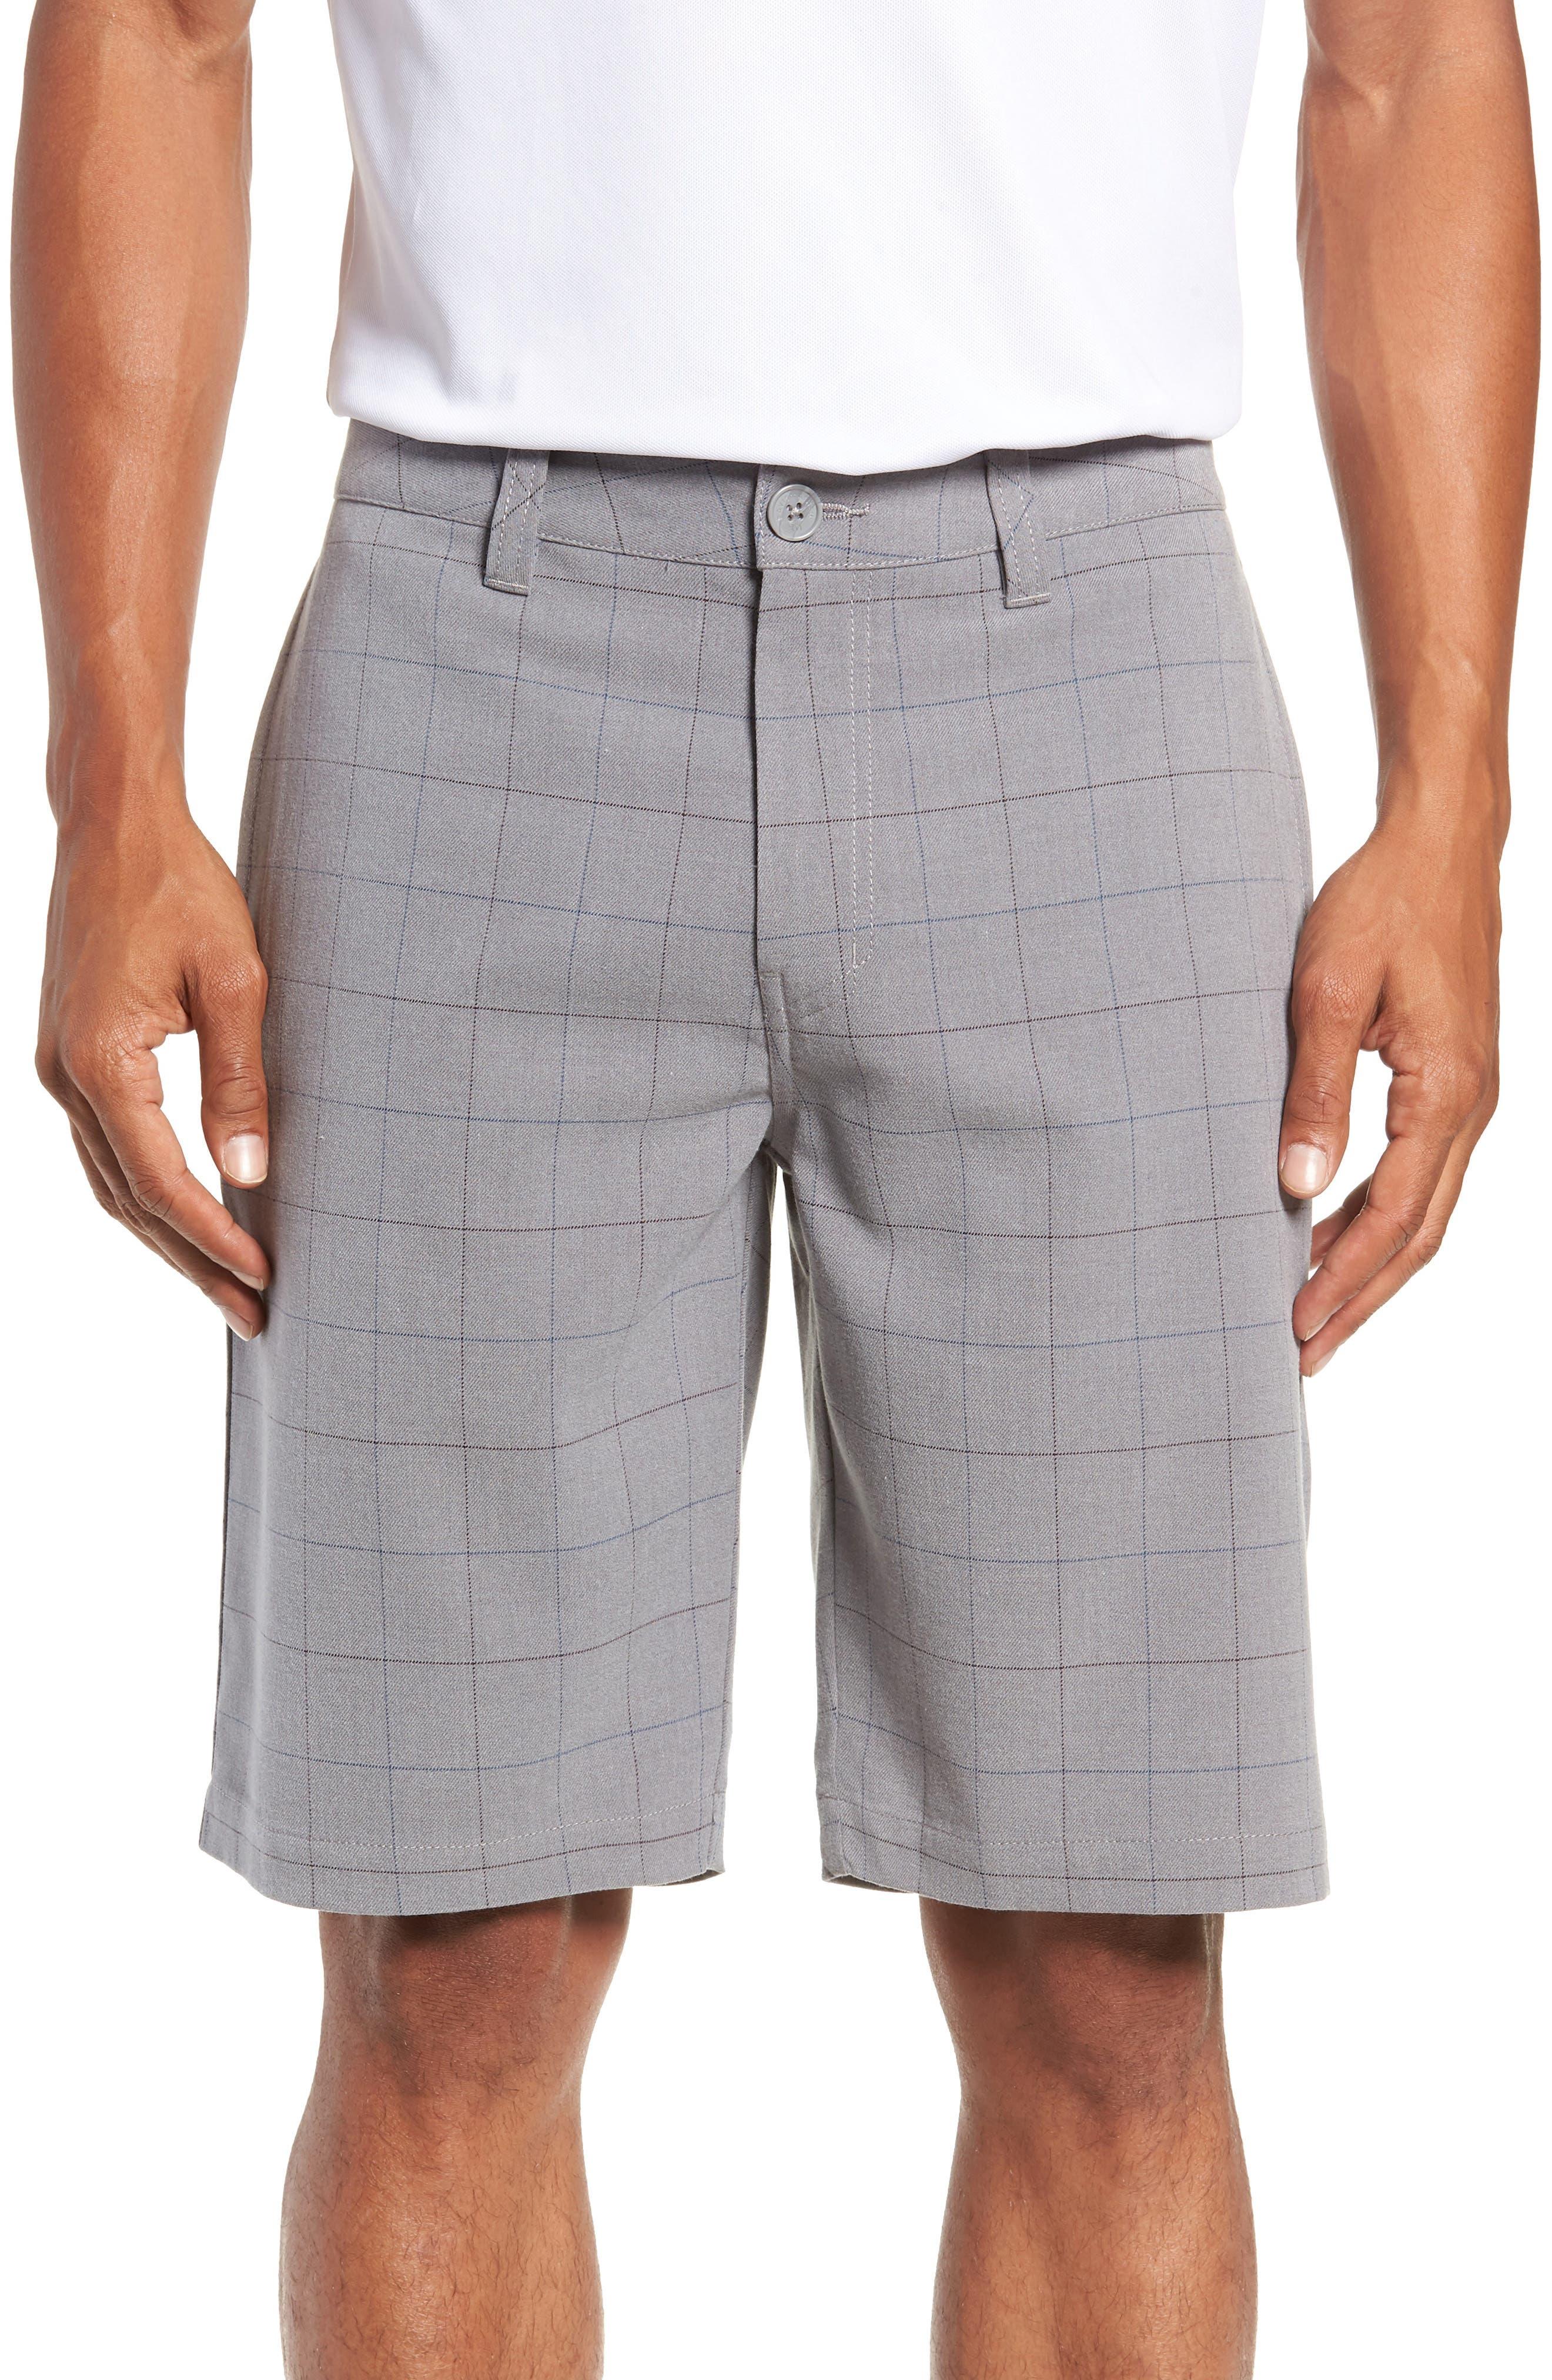 Rickles Regular Fit Shorts,                         Main,                         color, HEATHER SHARKSKIN